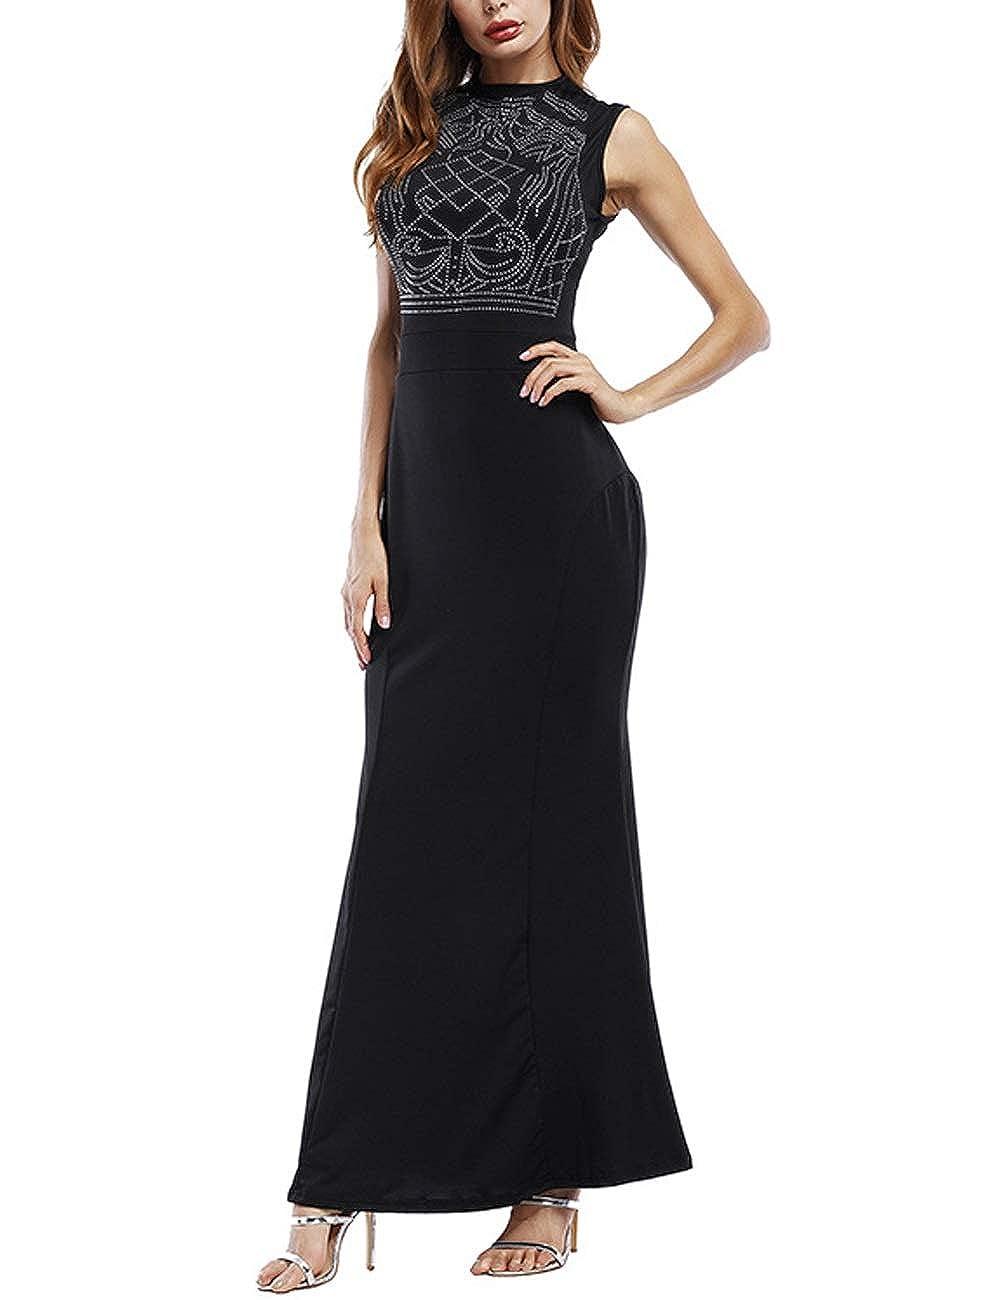 Dasior Womens Beaded Sleeveless Scoop Bodycon Long Prom Party Dress Back Zipper